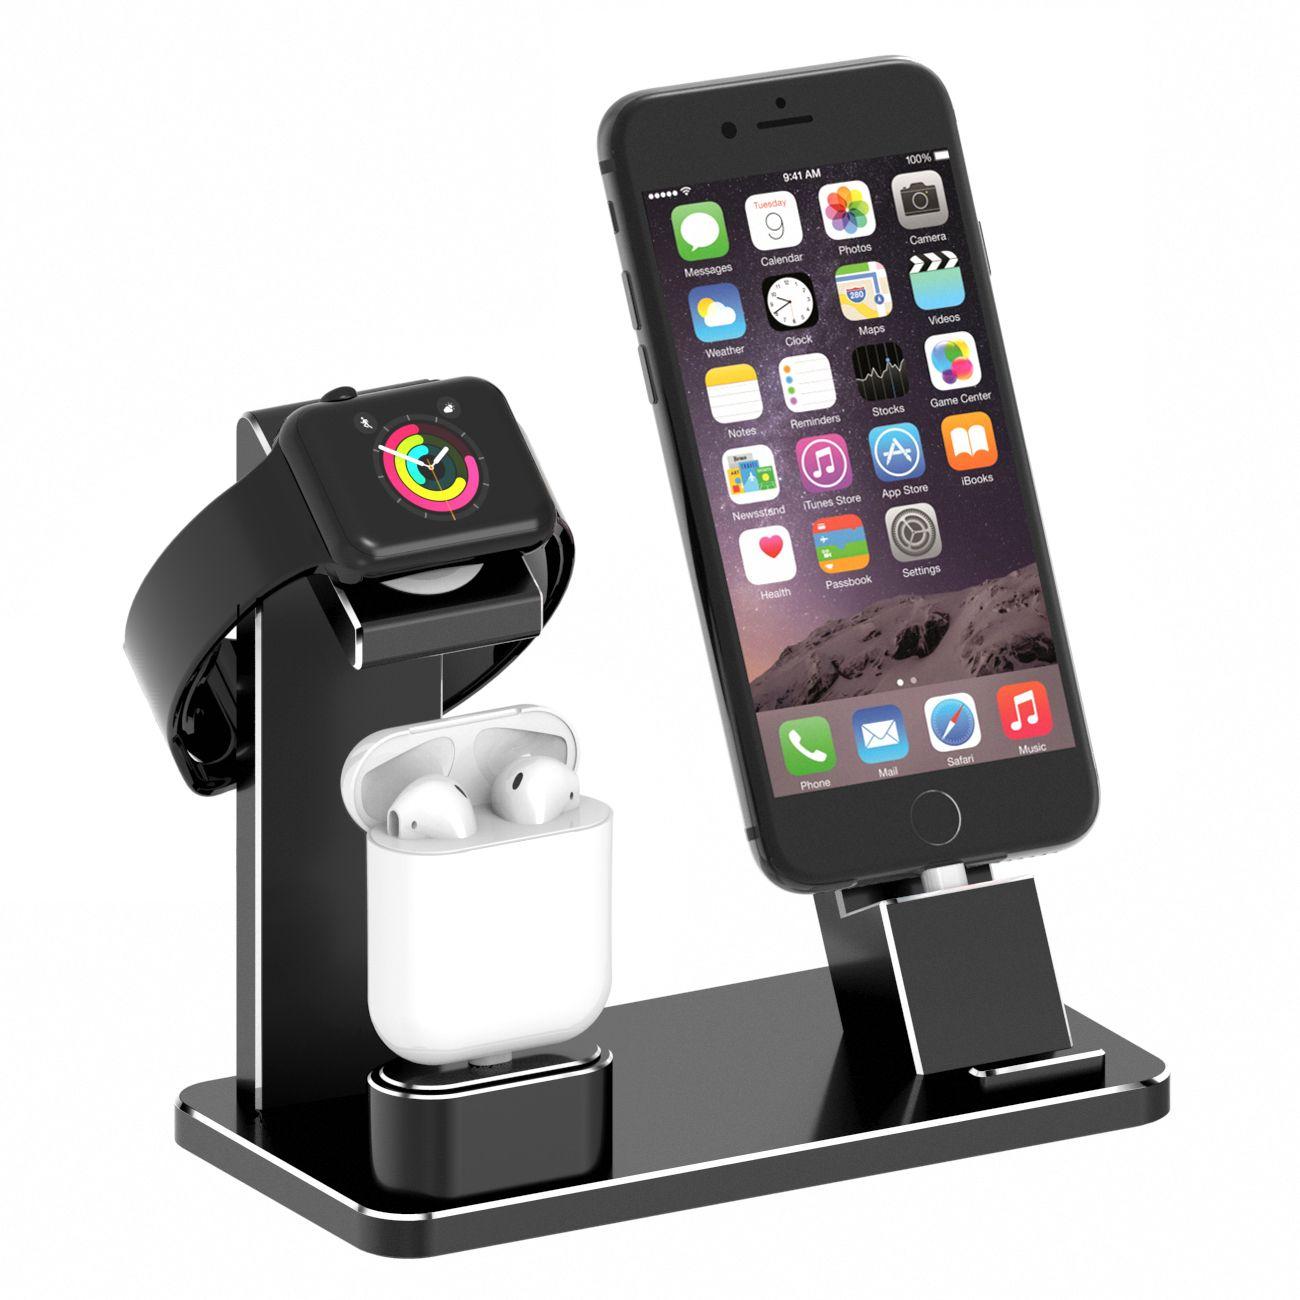 2 Night Stnder Fr Apple Armbanduhr Tintnwrap Spigen Watch Stand S350 Volt Black Premium Airpods Ladestation Aluminium